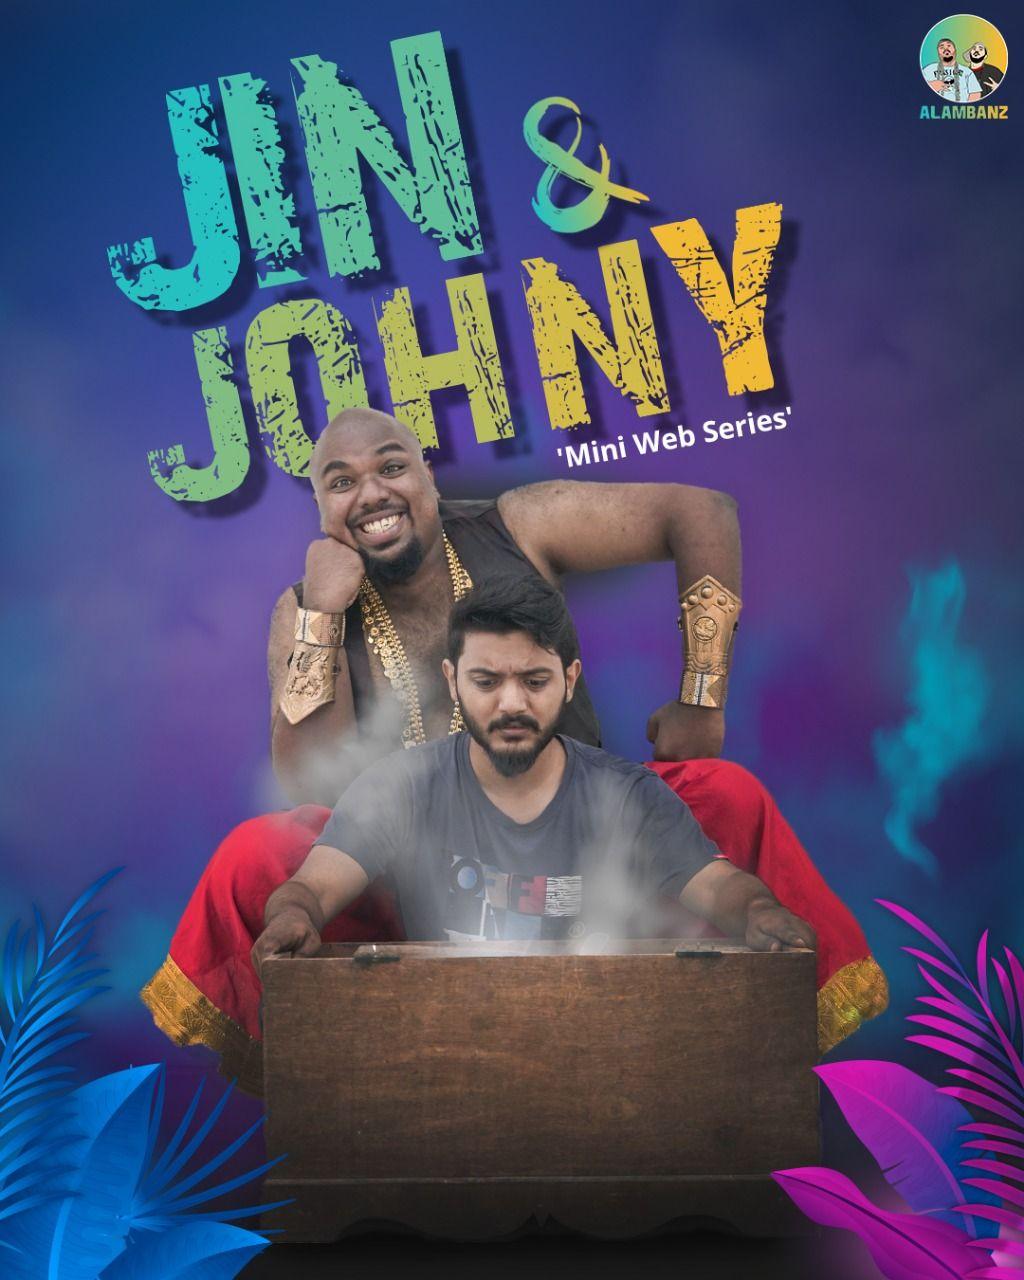 Malayalam Mini Web Series Promotional Poster For Jin Johny Alambanz In 2020 Social Media Advertising Design Social Media Poster Creative Poster Design